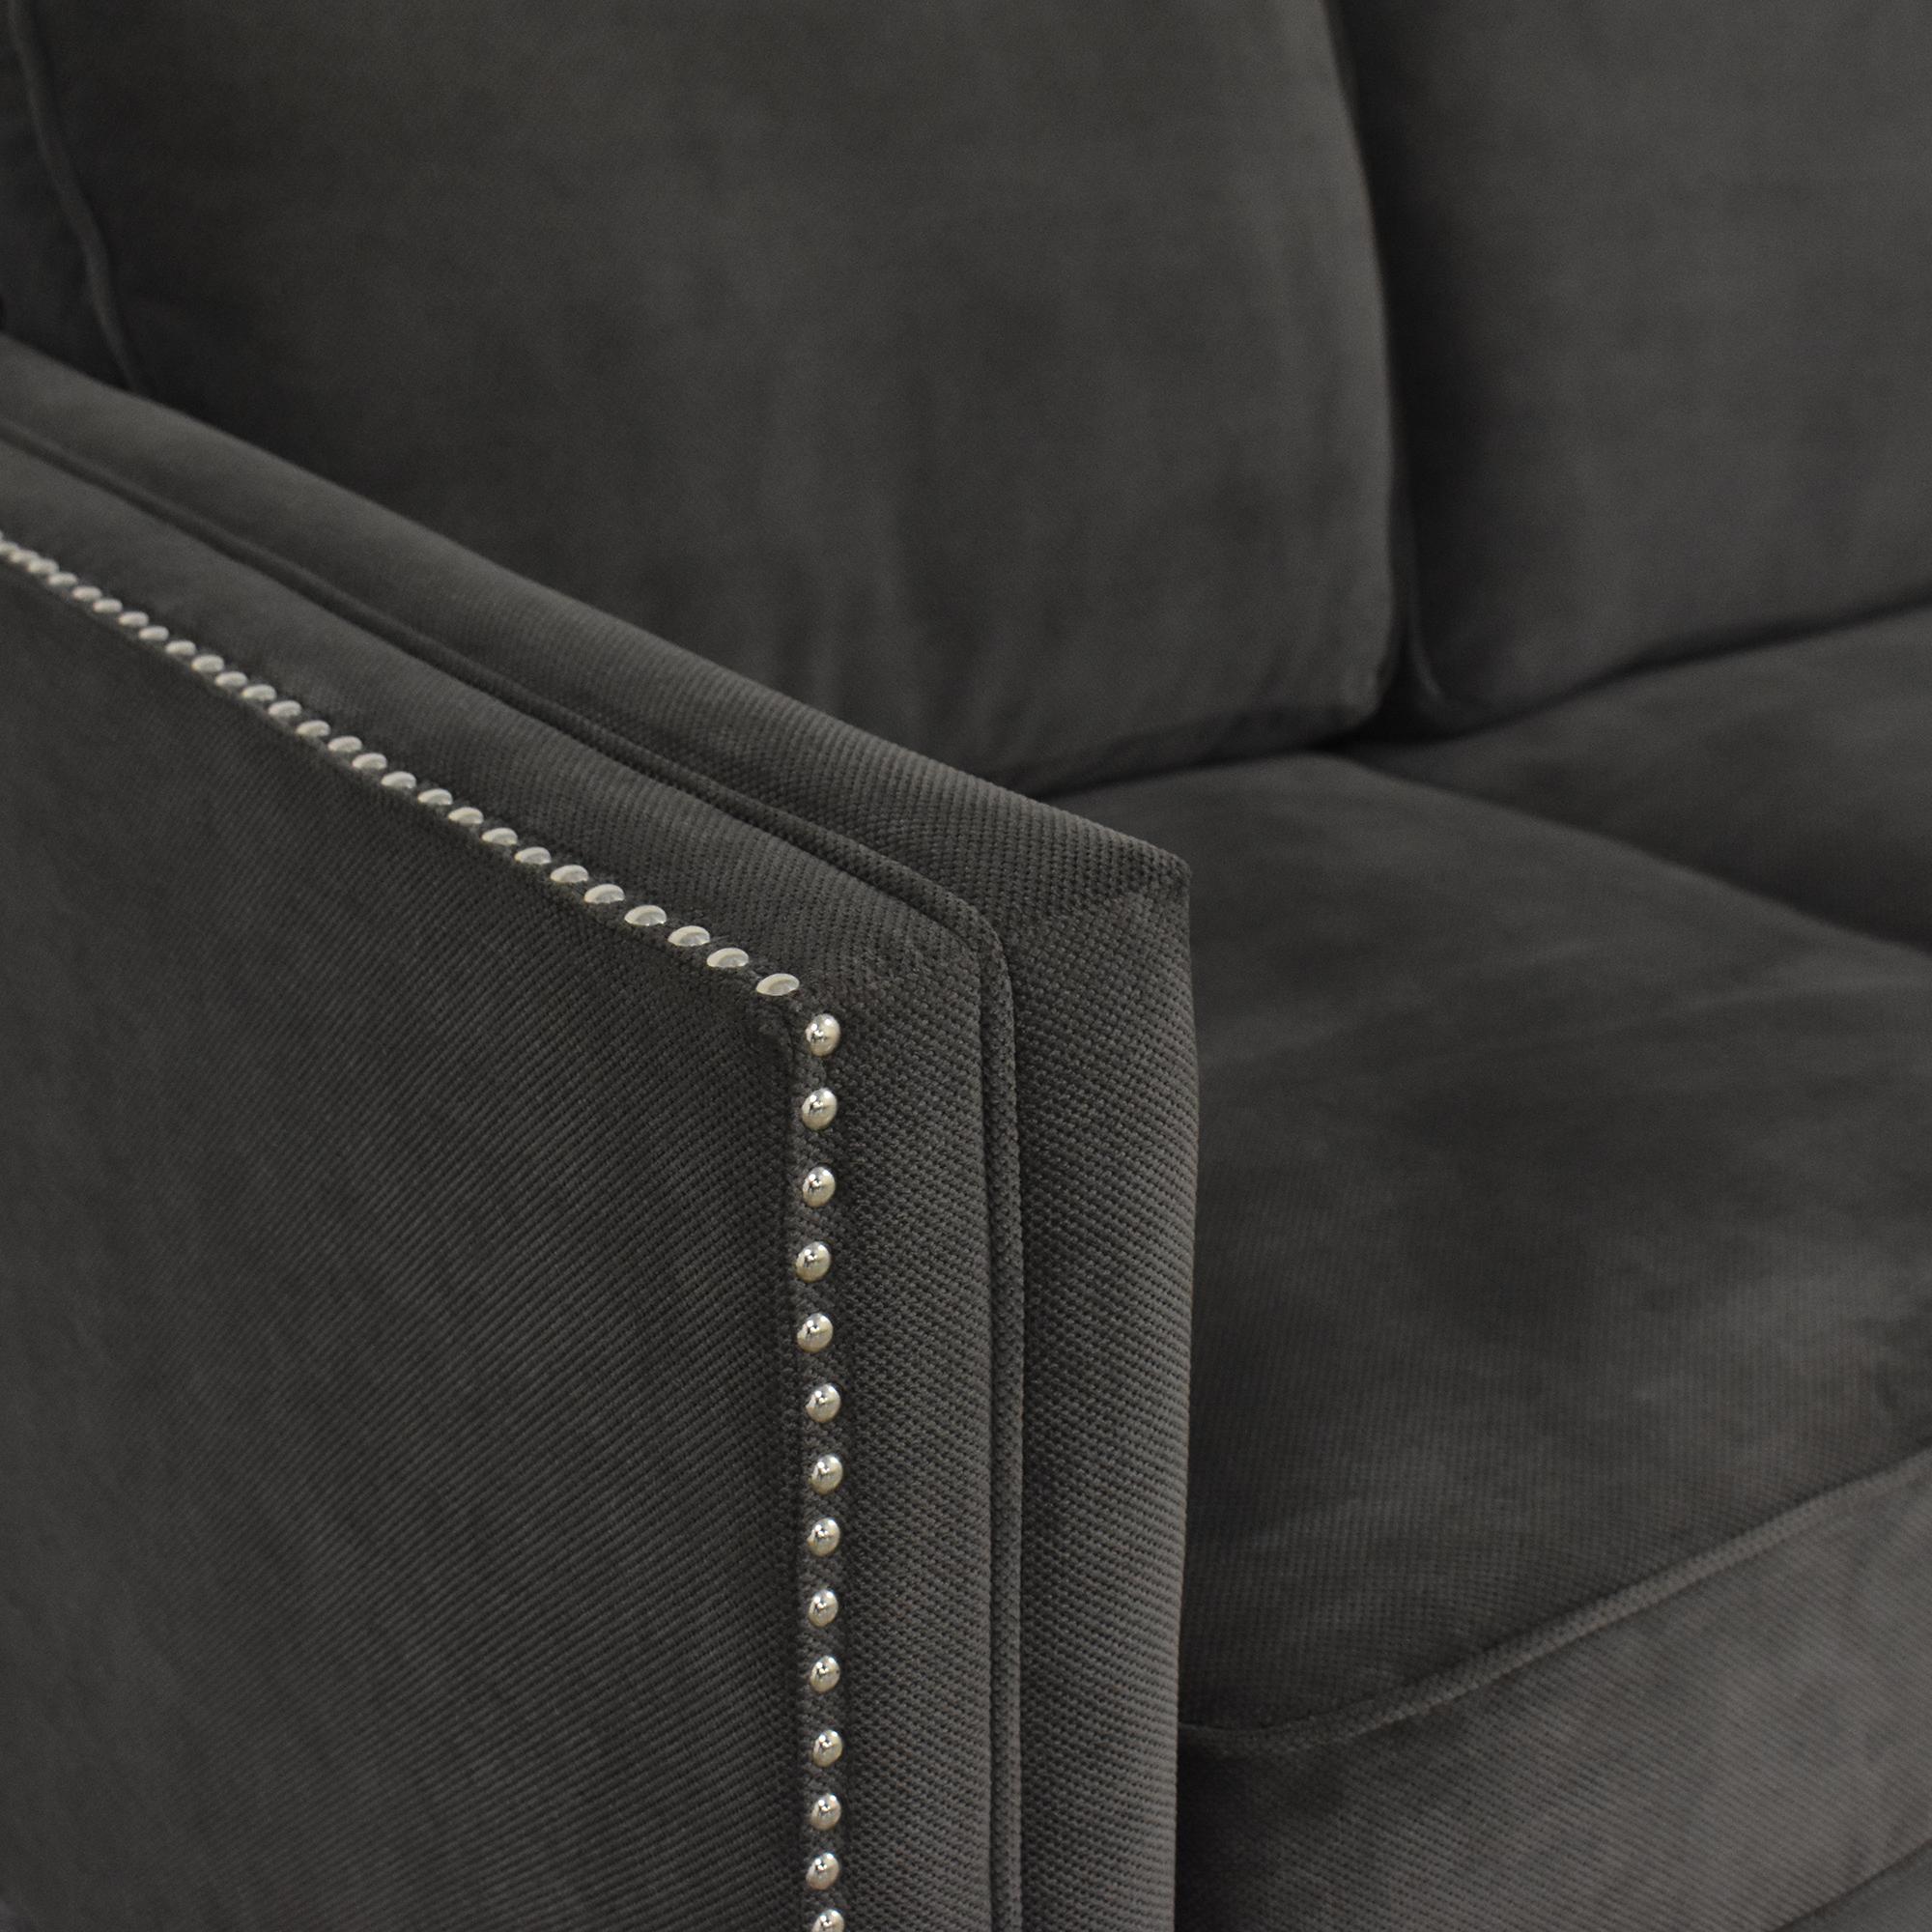 AllModern AllModern Nailhead Trim Sofa